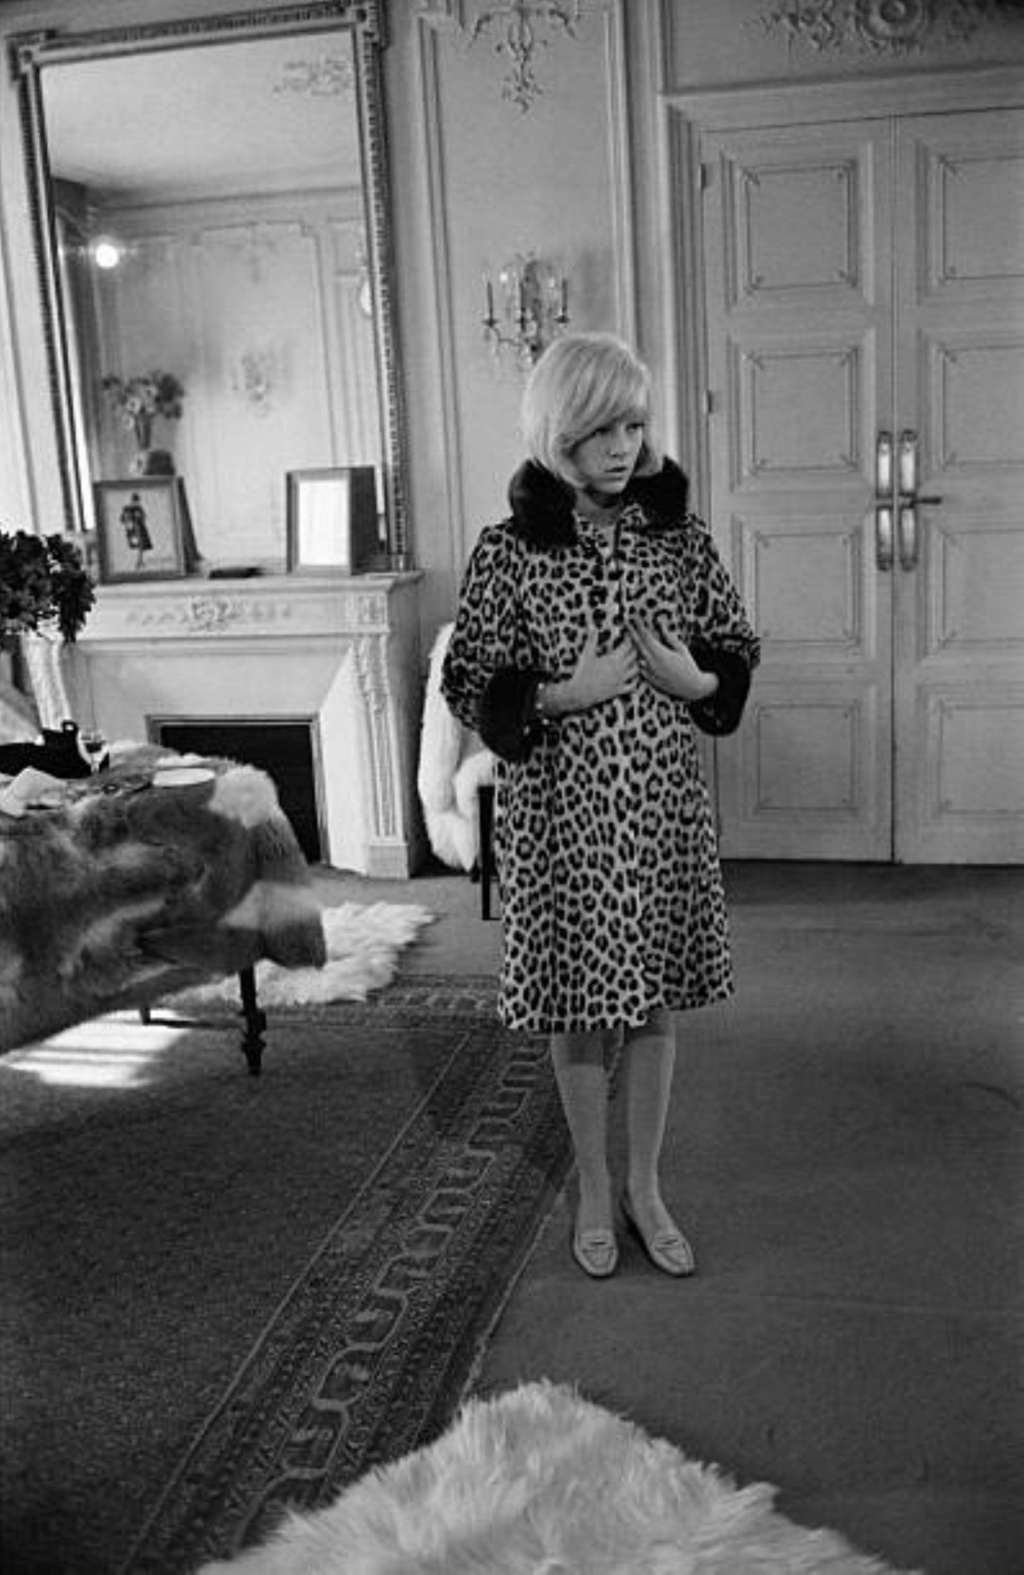 PROPRIETE OU A RESIDE JOHNNY HALLYDAY ( 3/10 ) 'NEUILLY SUR SEINE' ( 1965 ) 0918